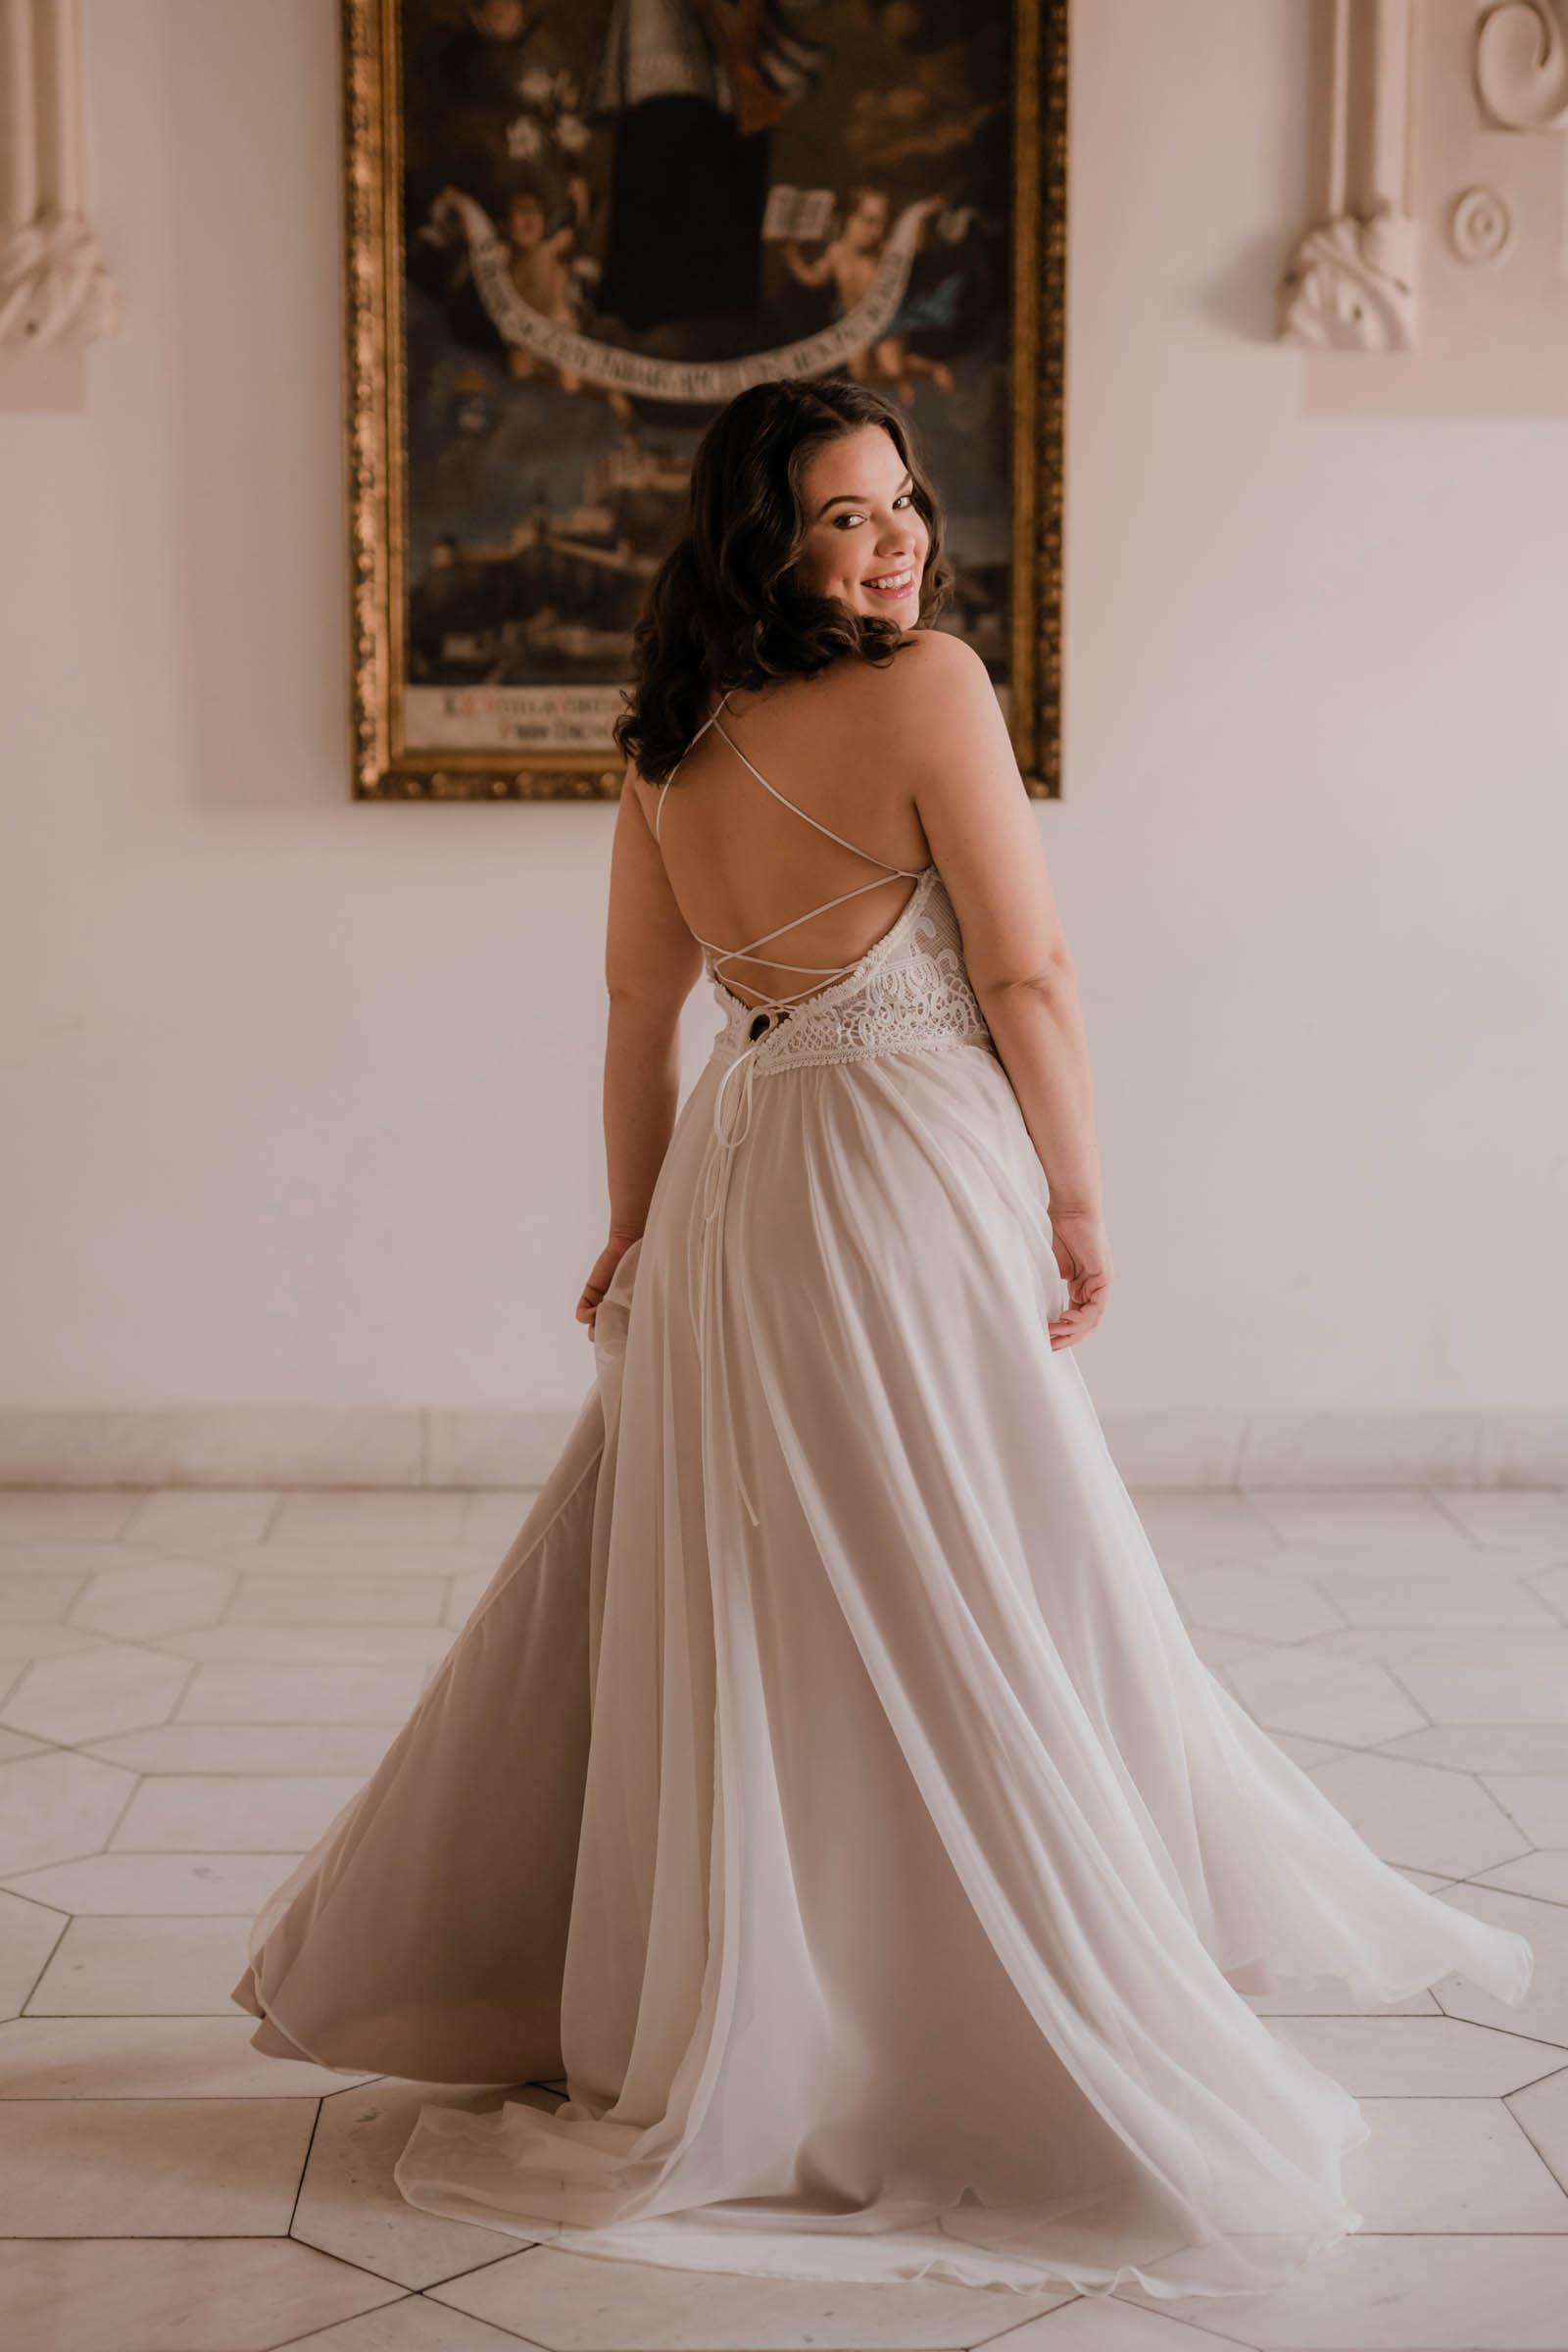 boho-svadobne-saty-veronika-kostkova-wedding-atelier-2019-tavia-2